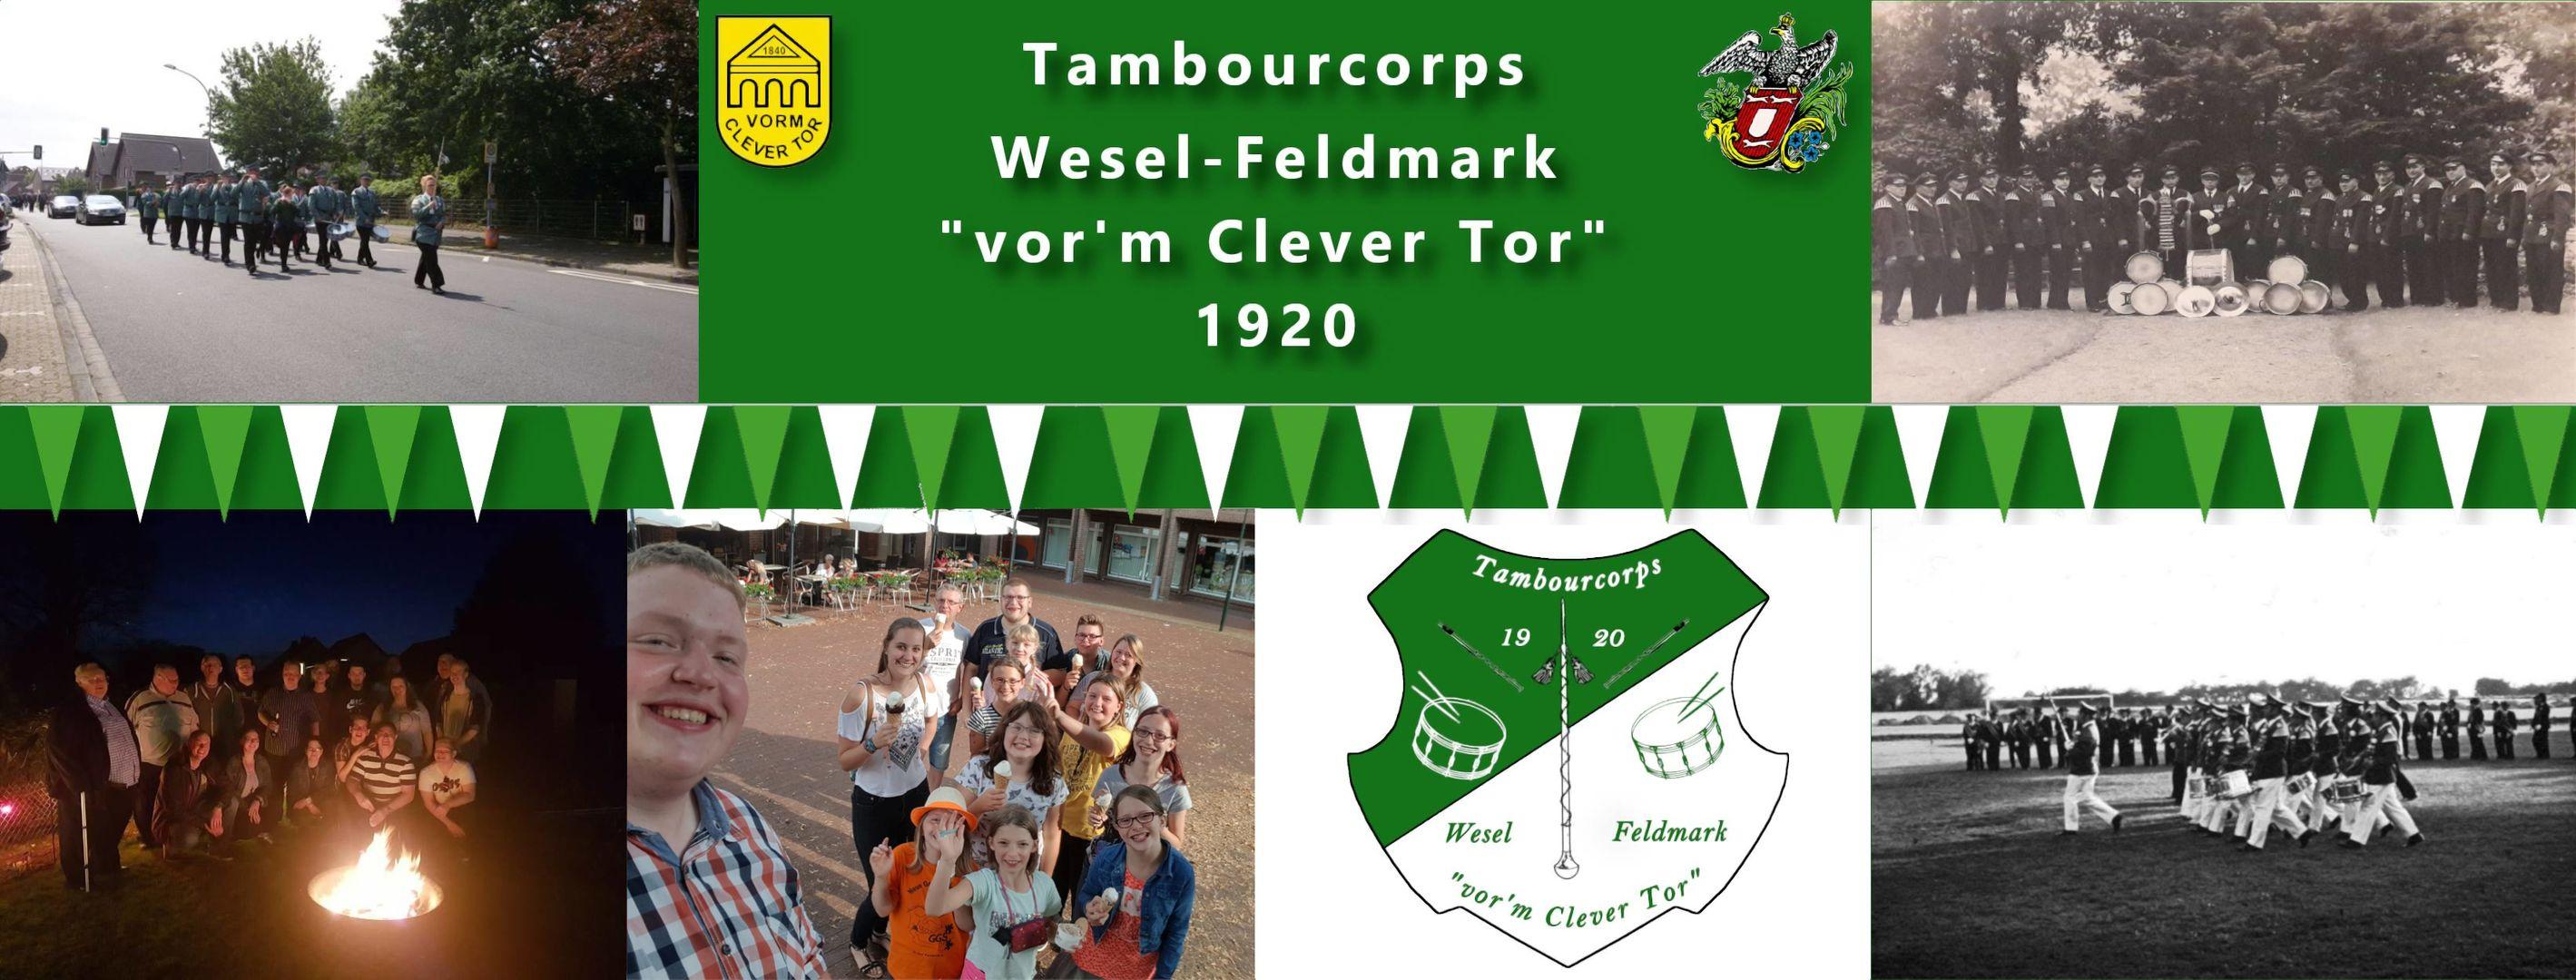 Aktuell | Tambourcorps Wesel-Feldmark vor'm Clever Tor 1920